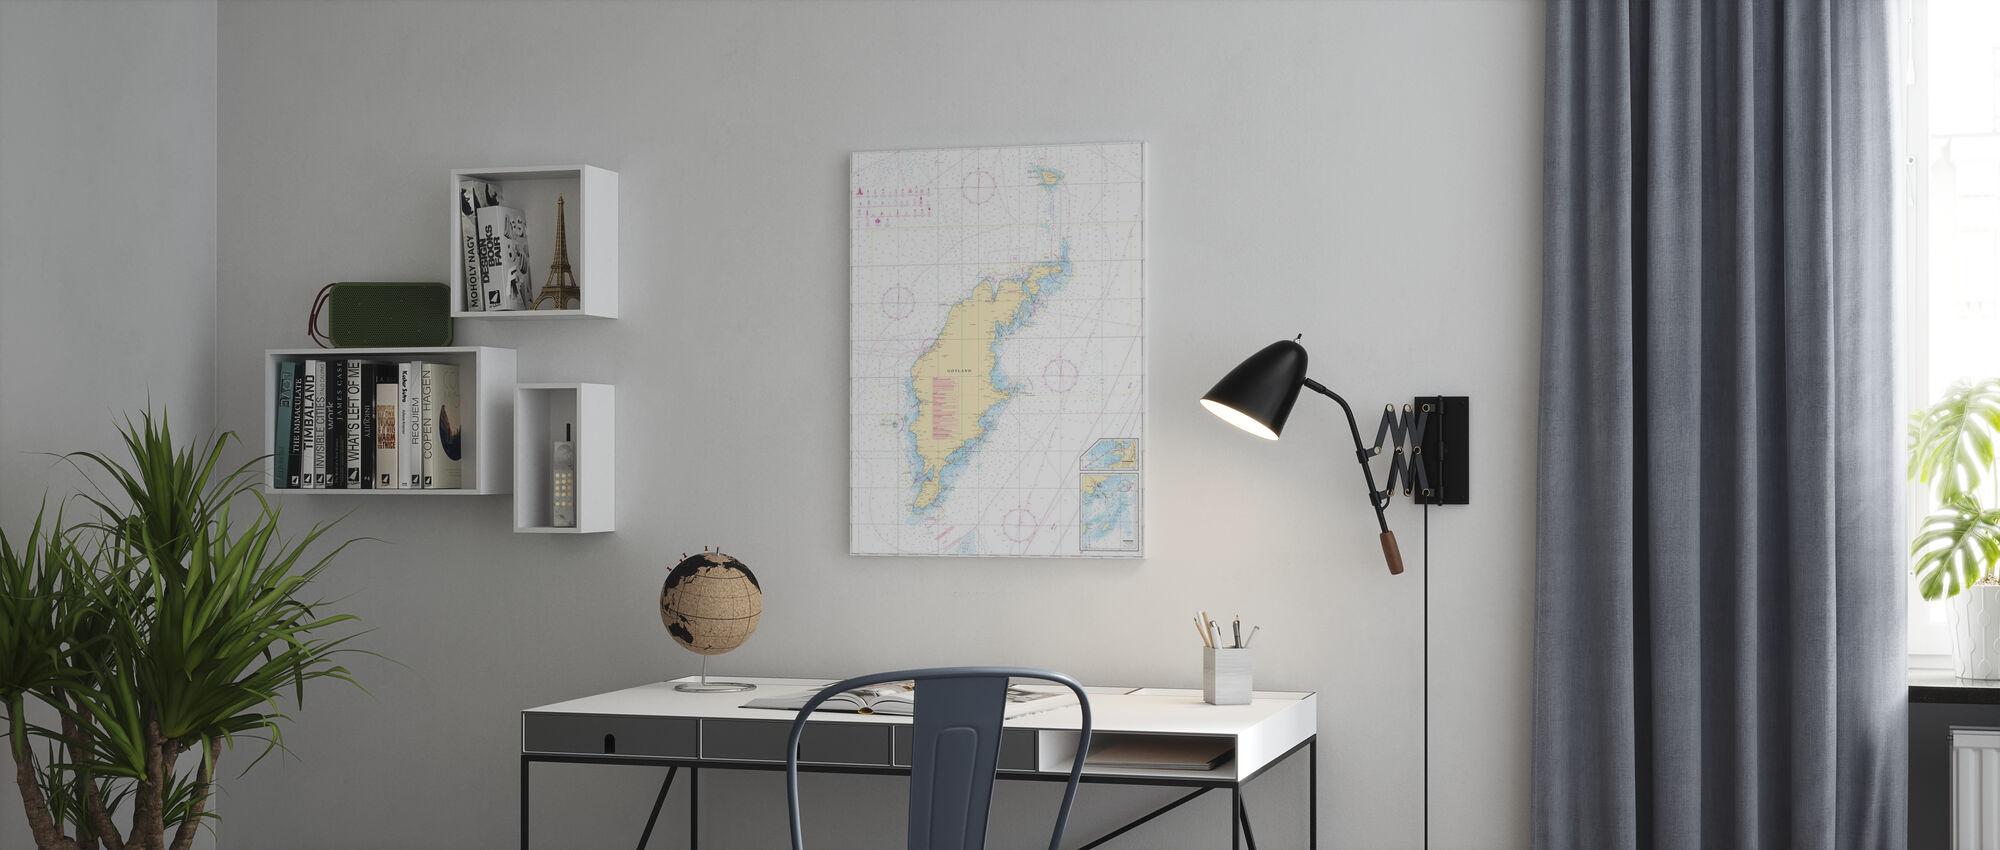 Zeekaart 73 - Gotland - Canvas print - Kantoor